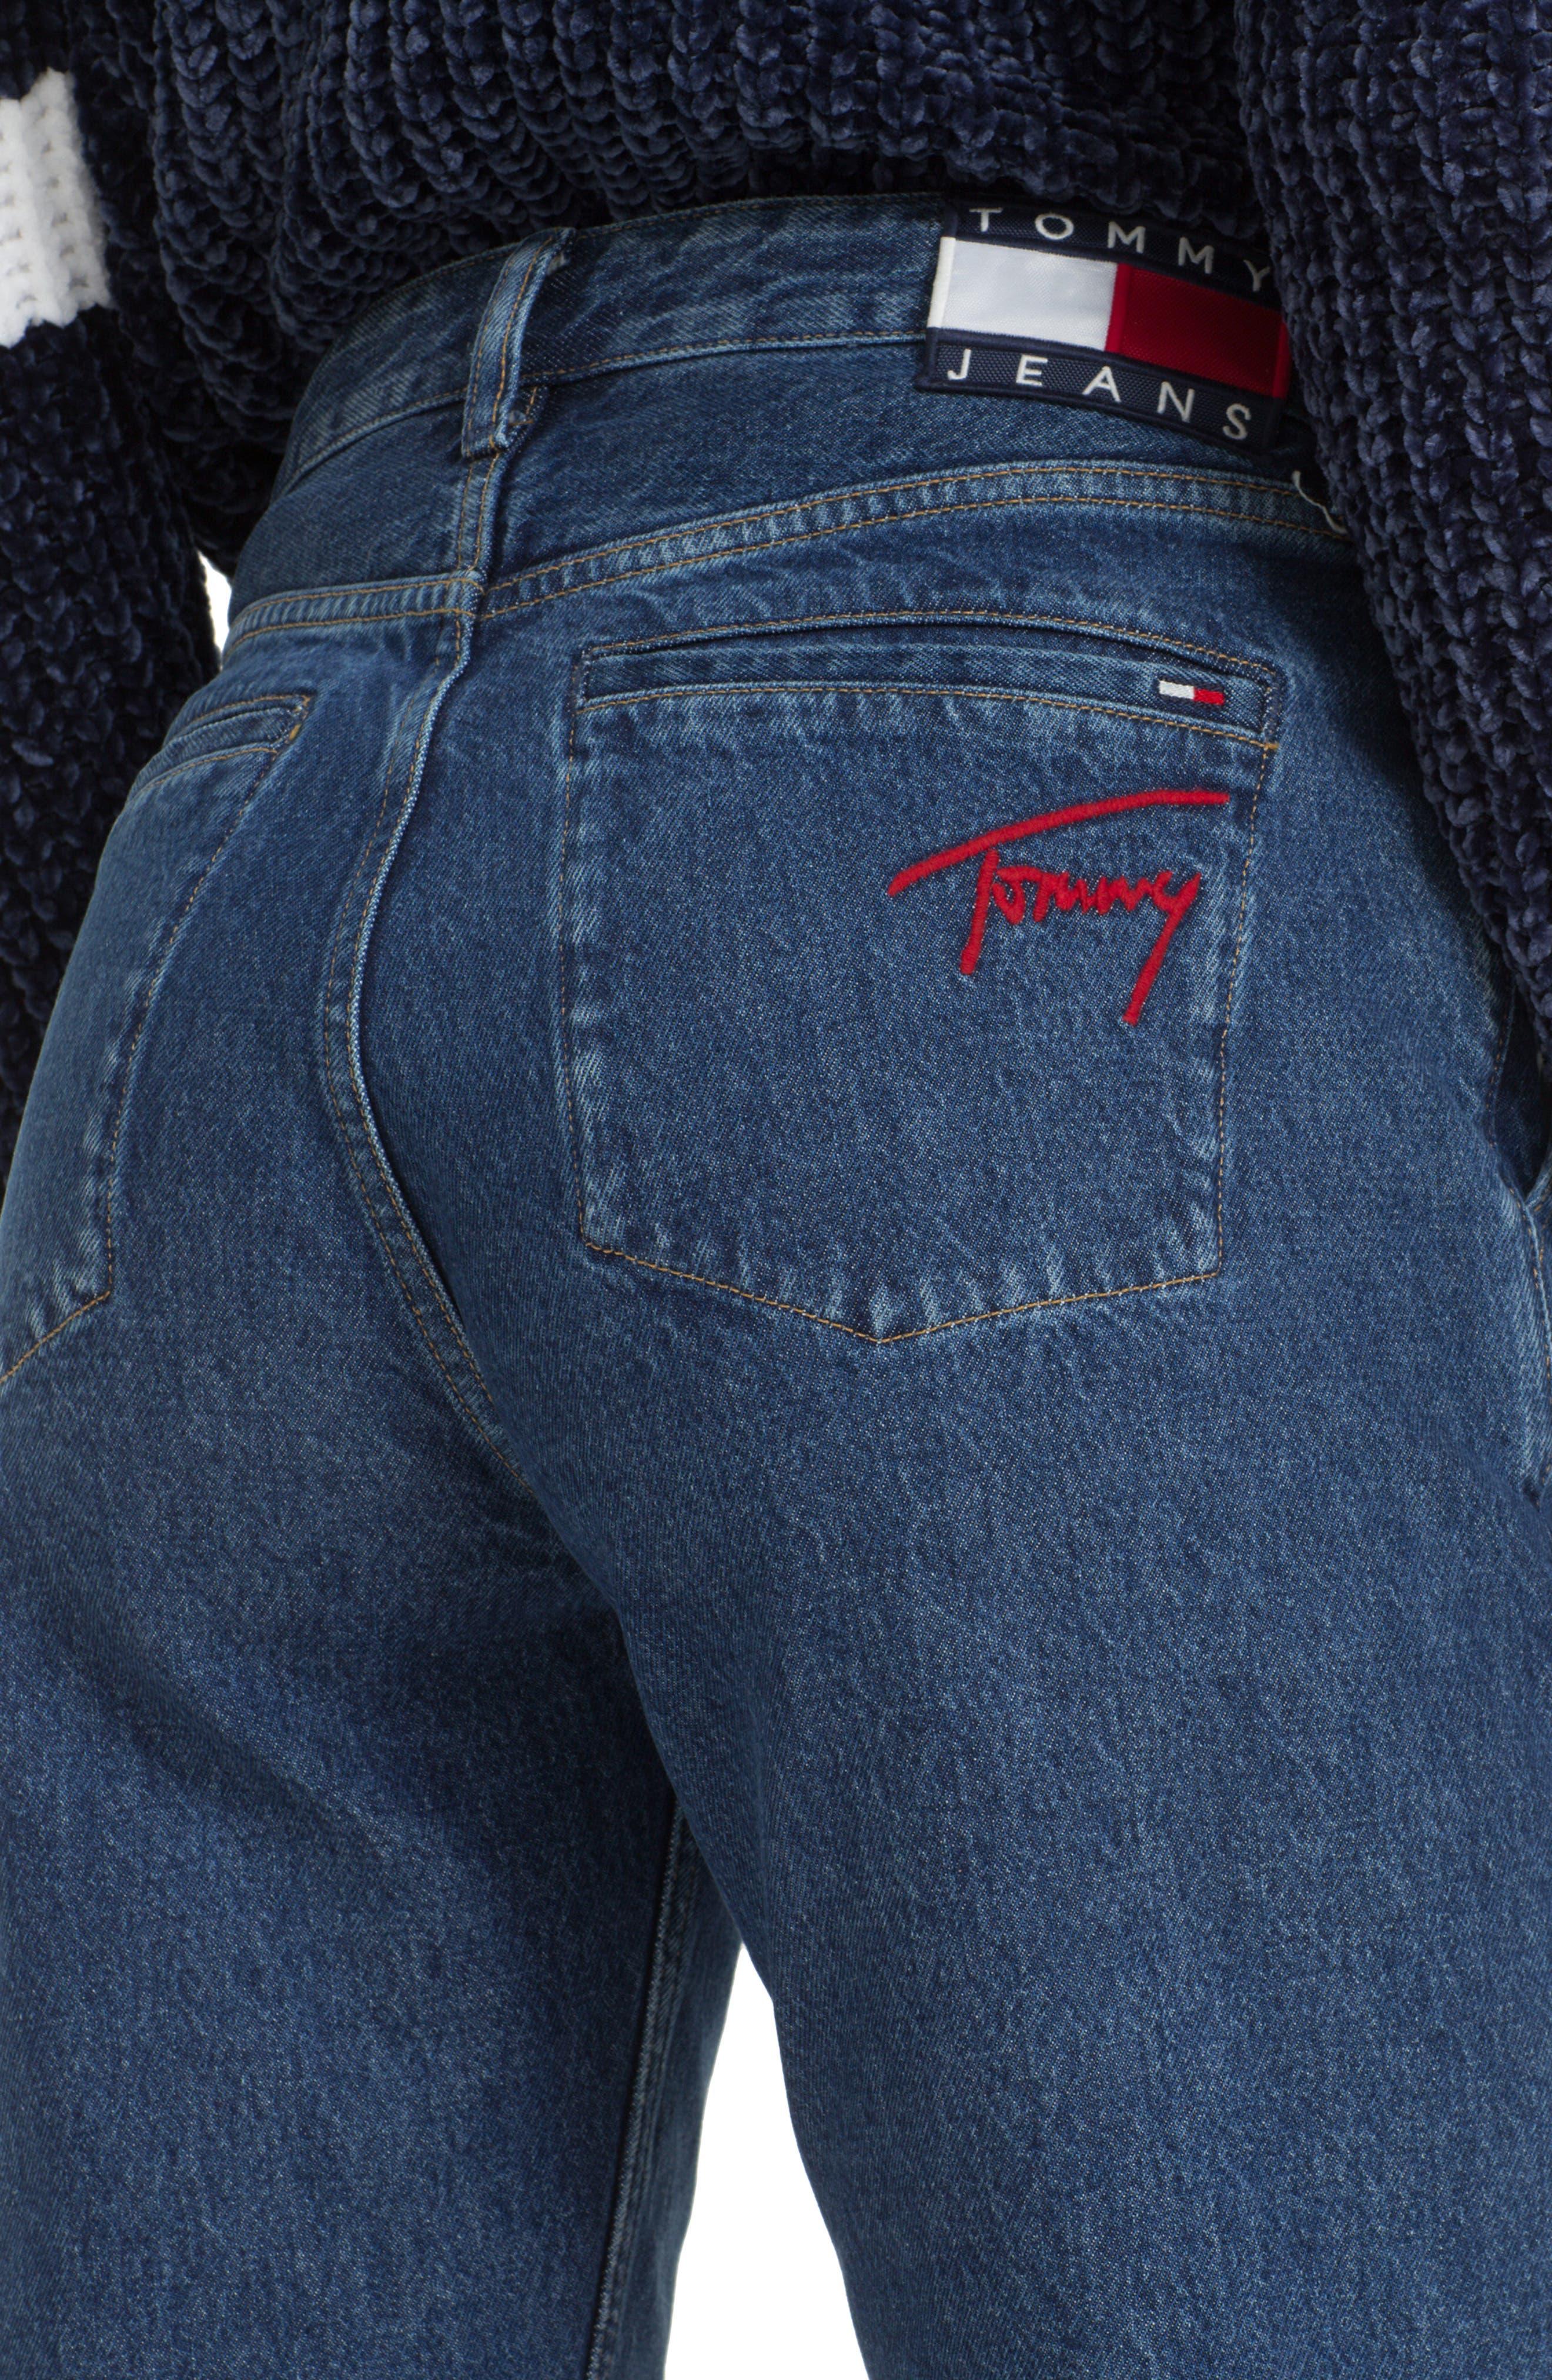 TJW Straight Leg Jeans,                             Alternate thumbnail 4, color,                             GOUGH MID BLUE RIGID